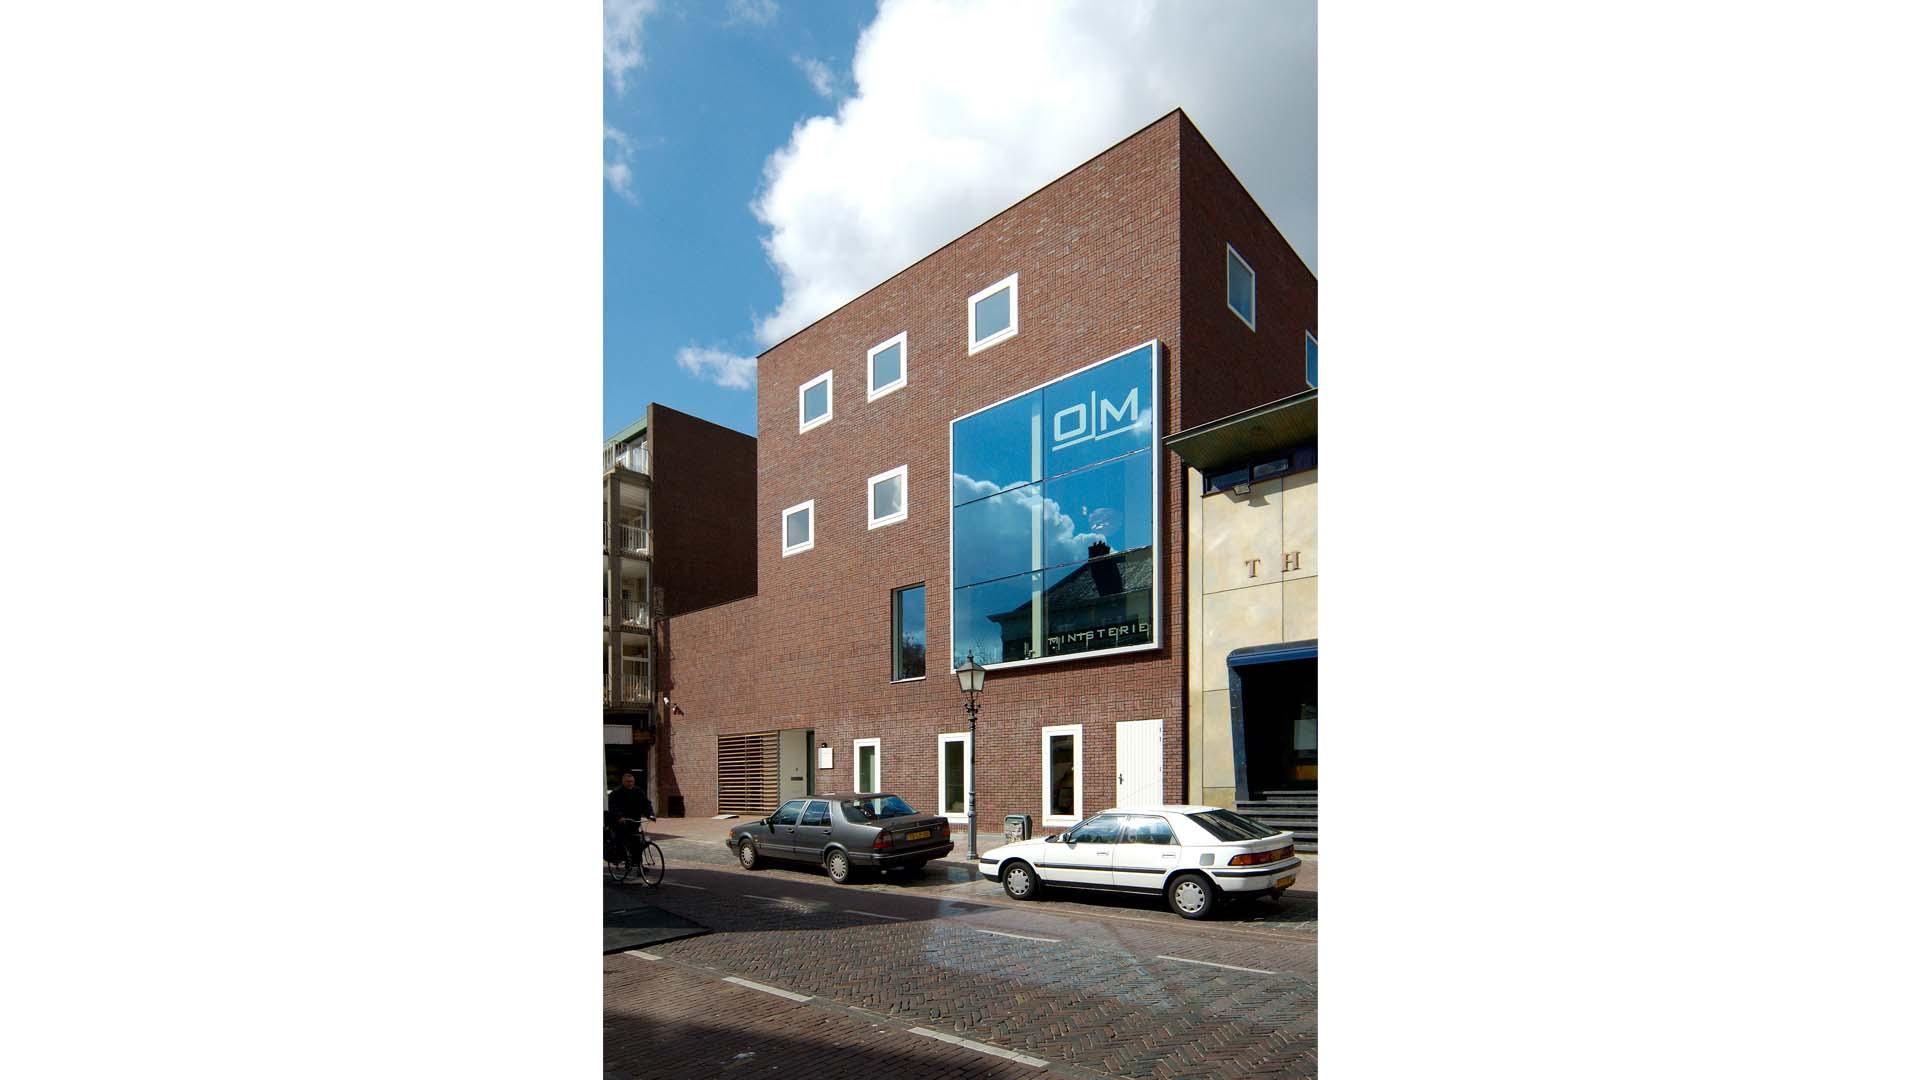 0027_Openbaar Ministerie Brinkstraat Assen_02